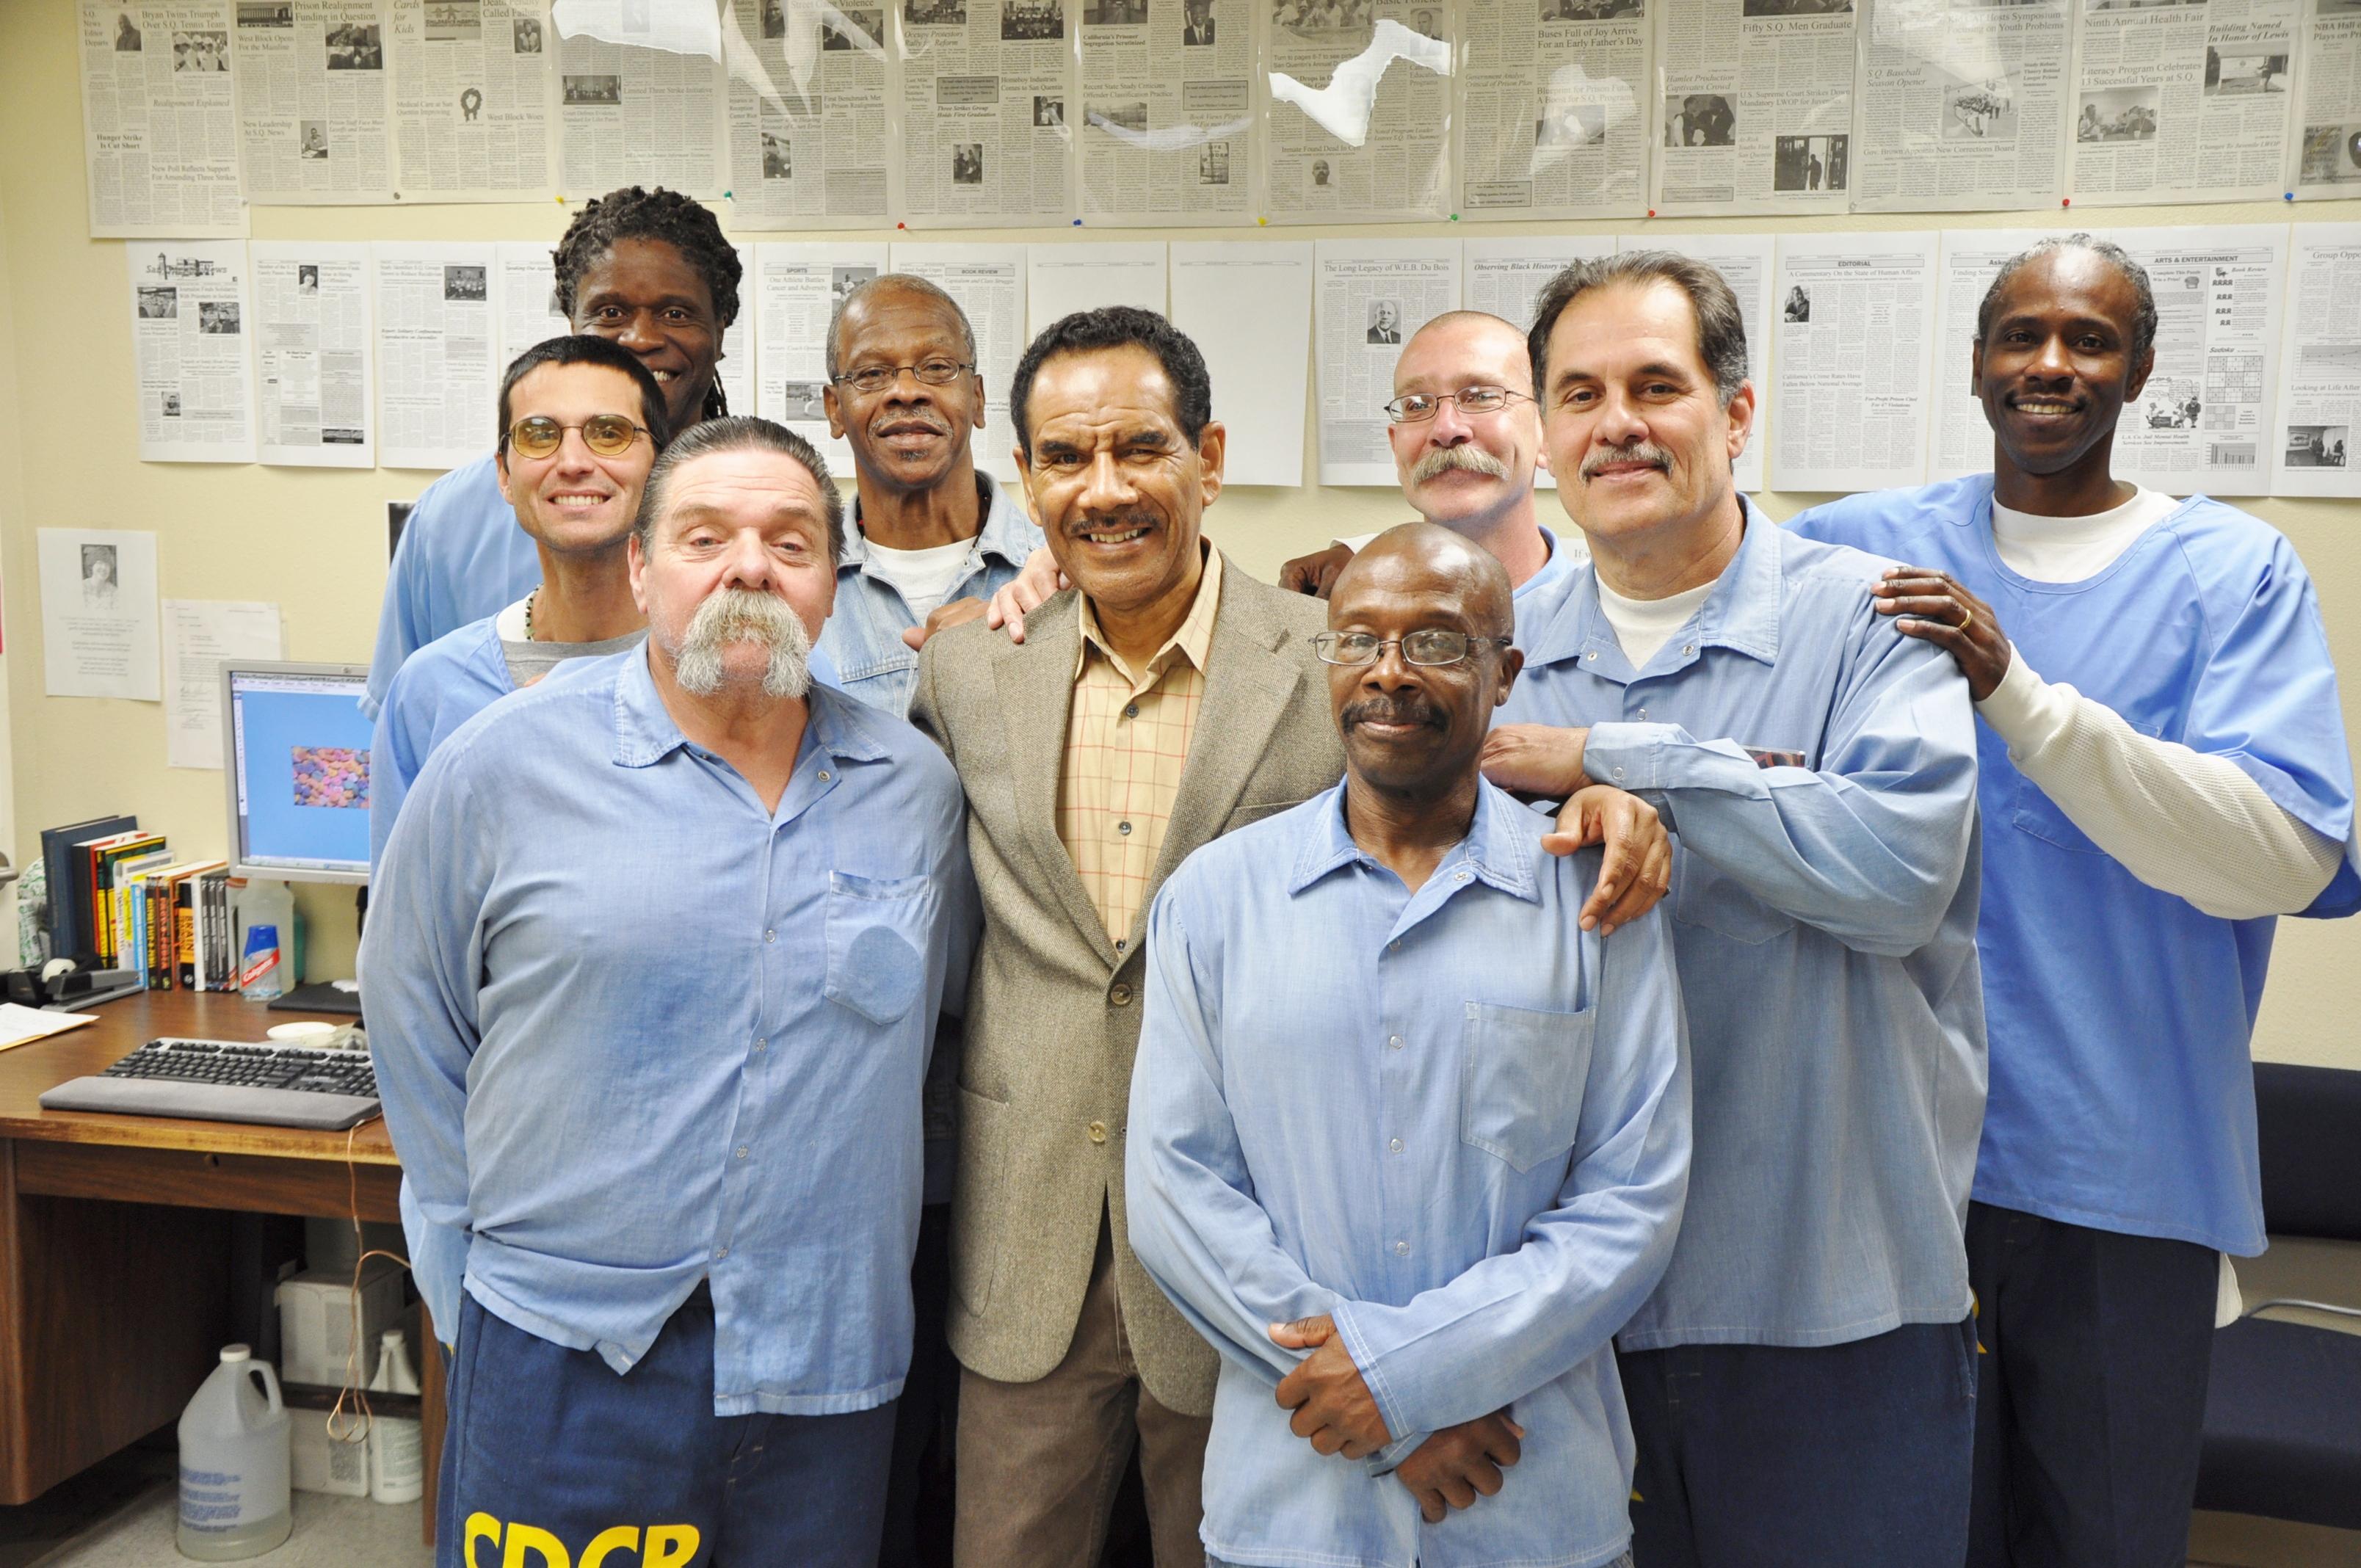 The-San-Quentin-news-staff